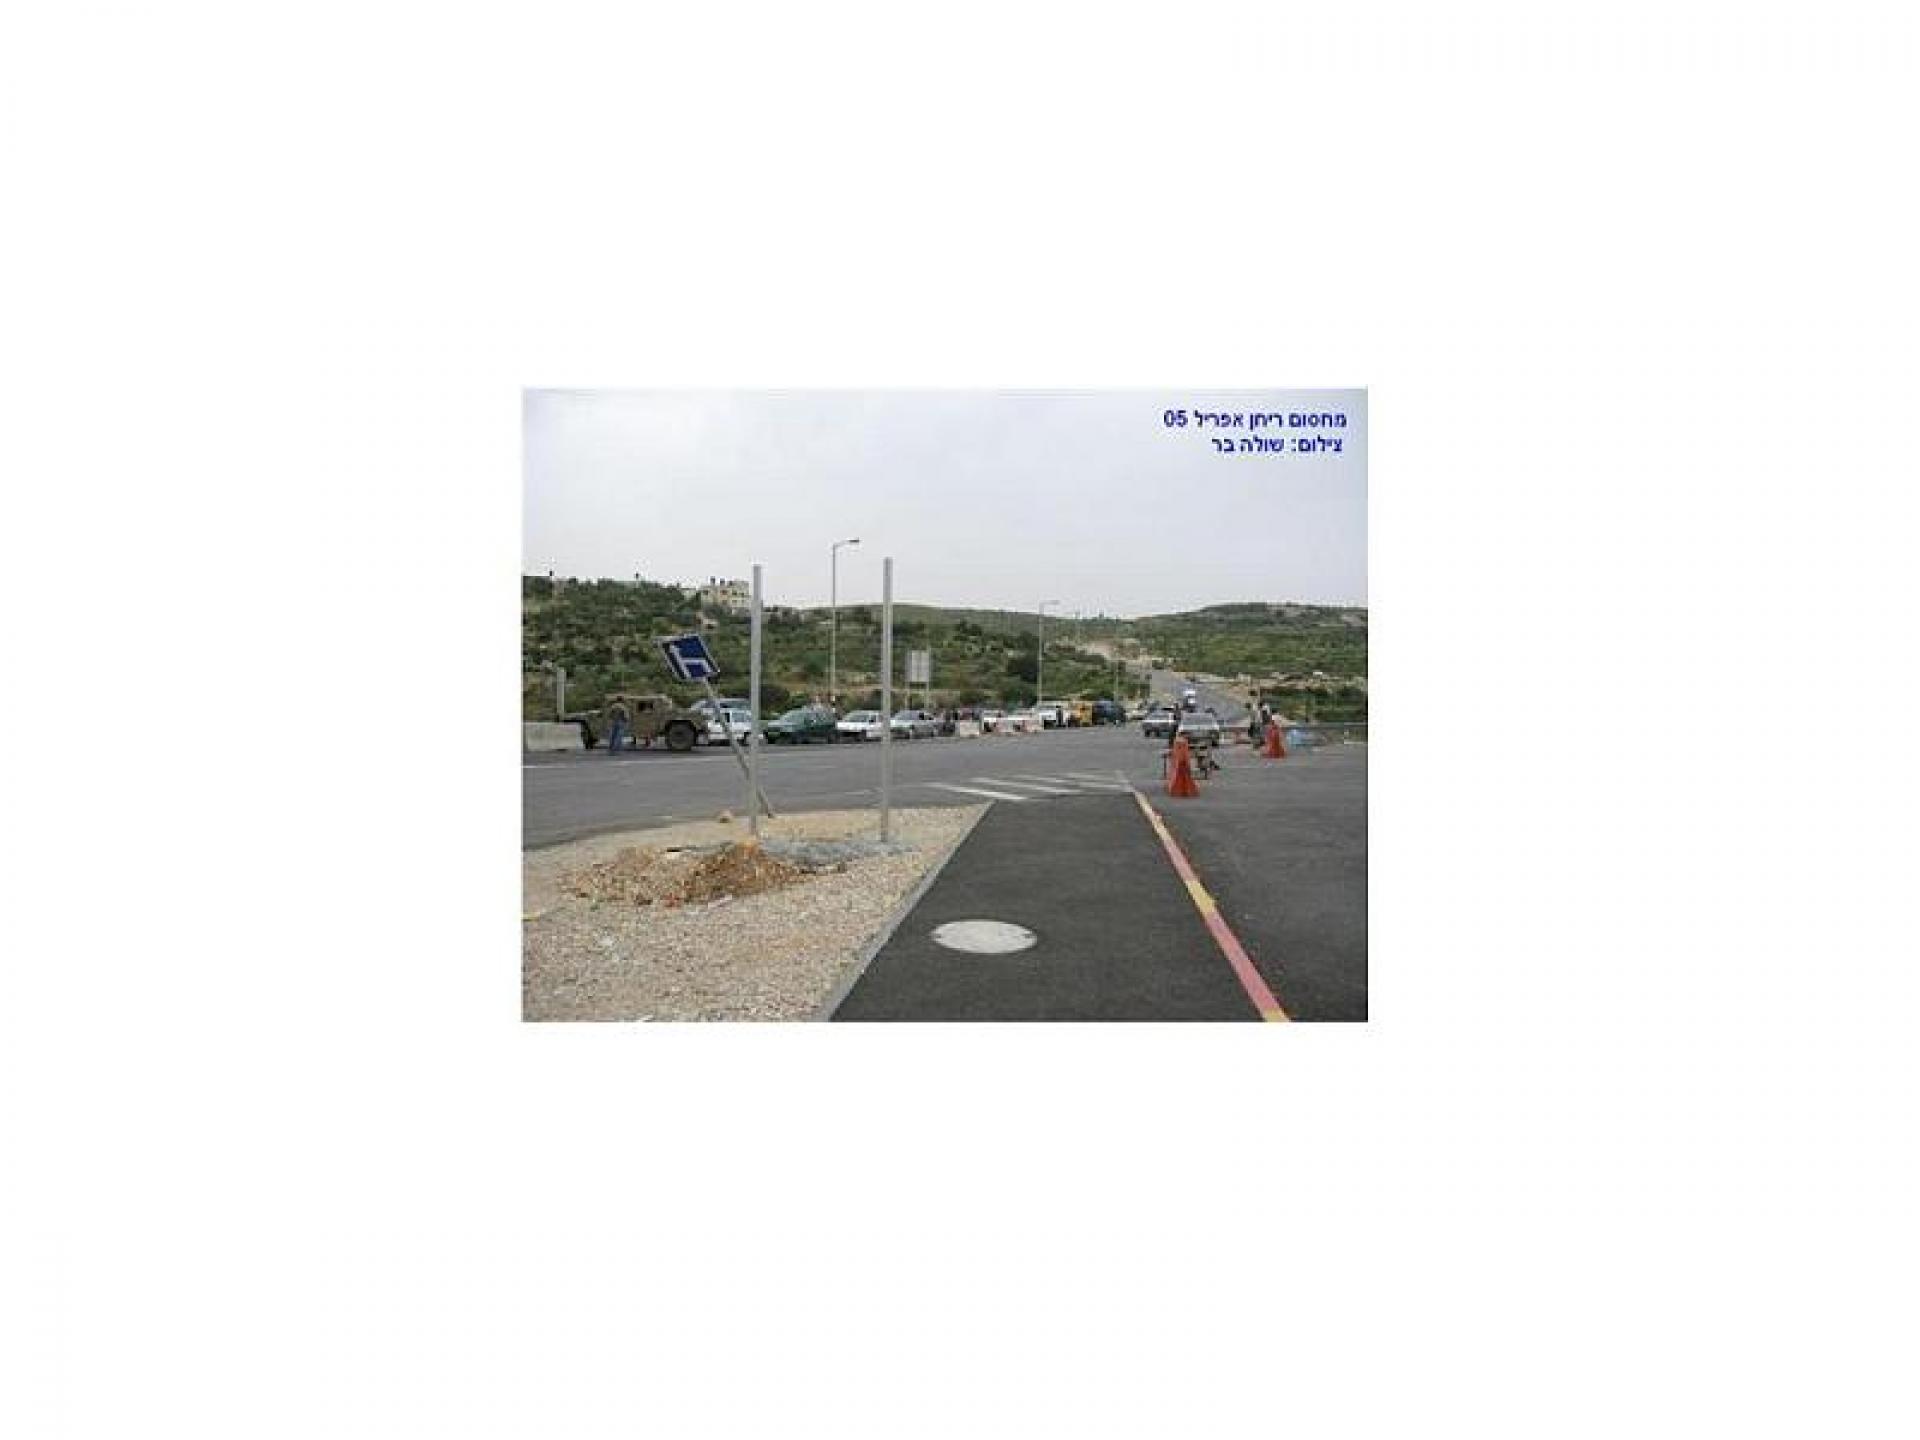 Barta'a/Reikhan checkpoint 15.04.05